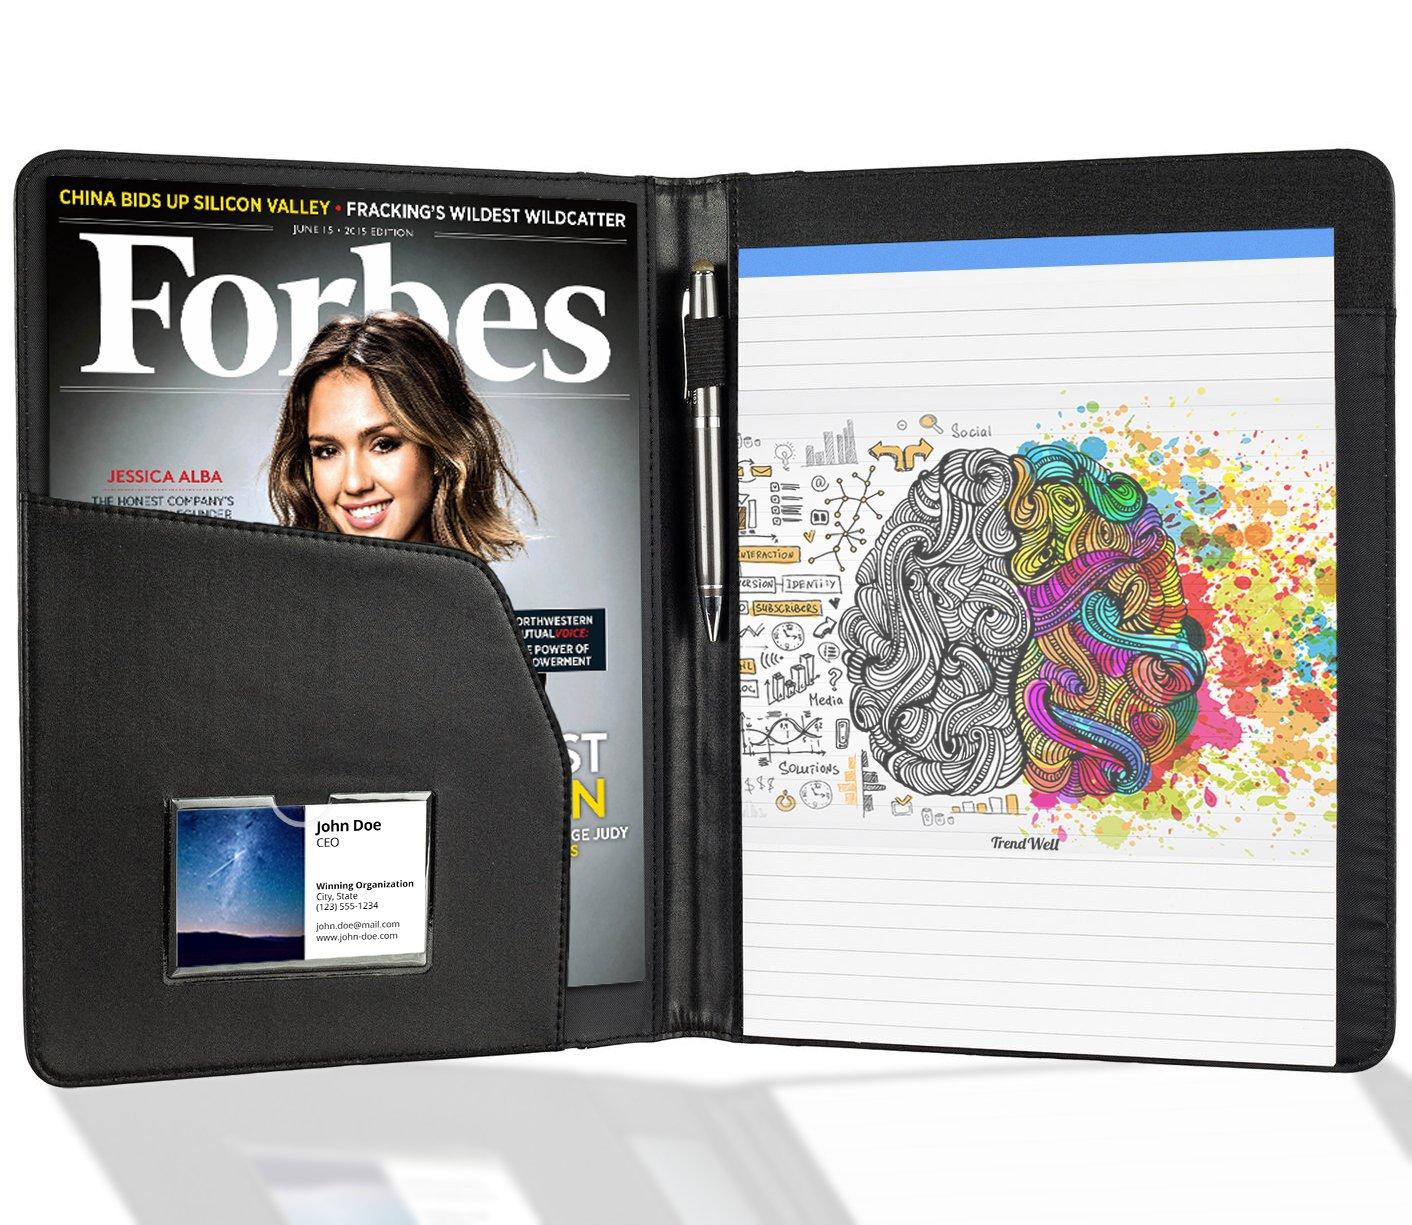 Padfolio / Portfolio Folder - Business Portfolio Organizer - Faux Leather Binder Folio - With 8.5'' x 11'' Writing Pad - Premium Black & Elegant Stitching - Designed For Resumes, Interviews & Business